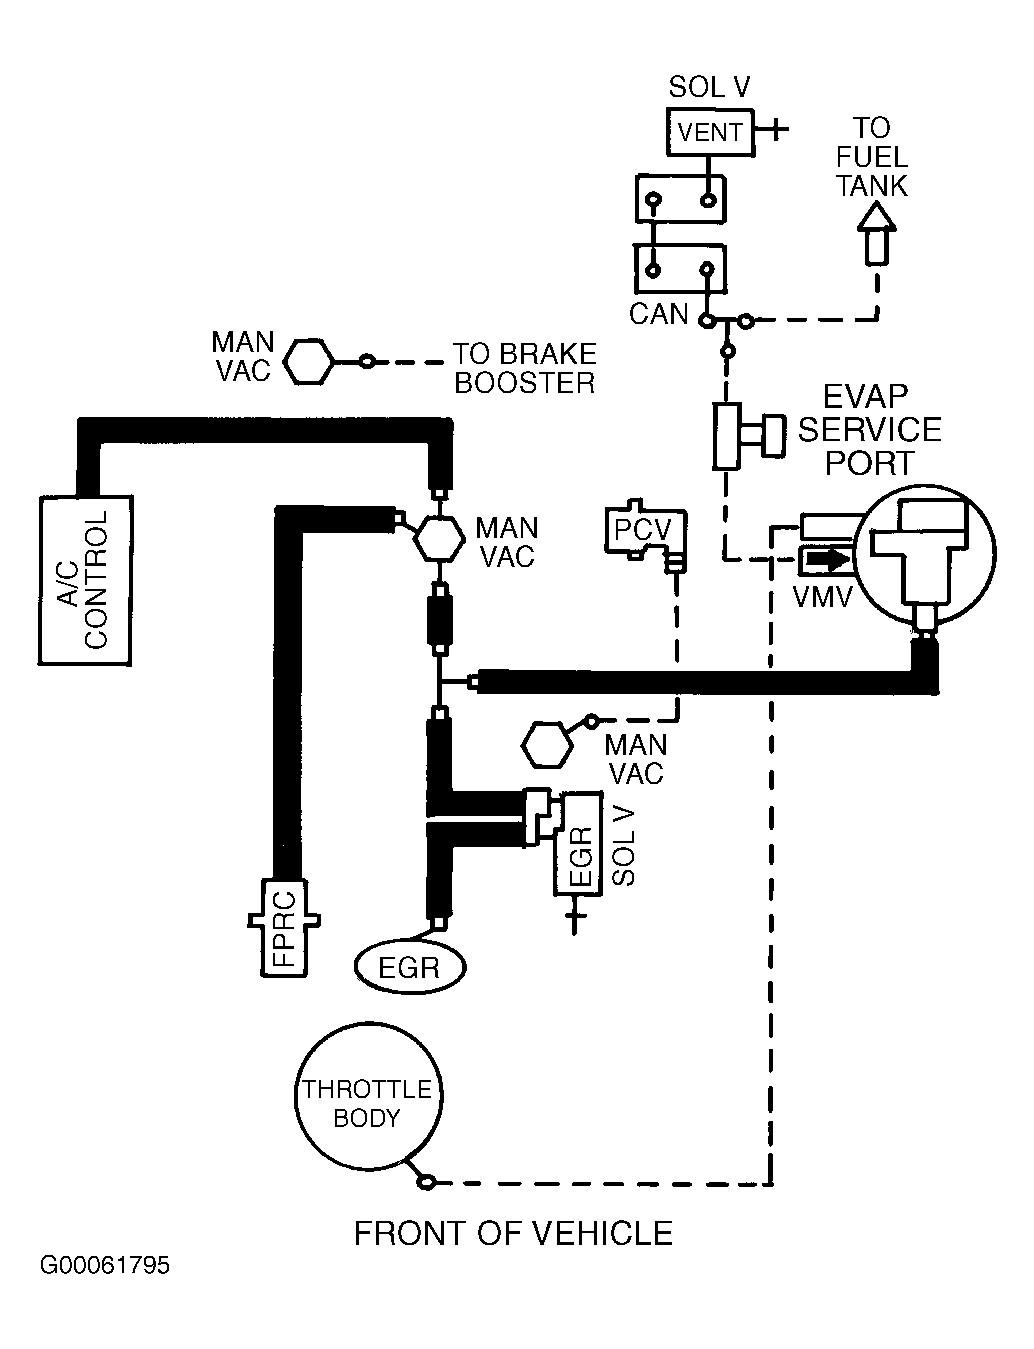 2003 ford windstar vacuum hose diagram mercedes sprinter trailer wiring 2001 explorer sport trac auto